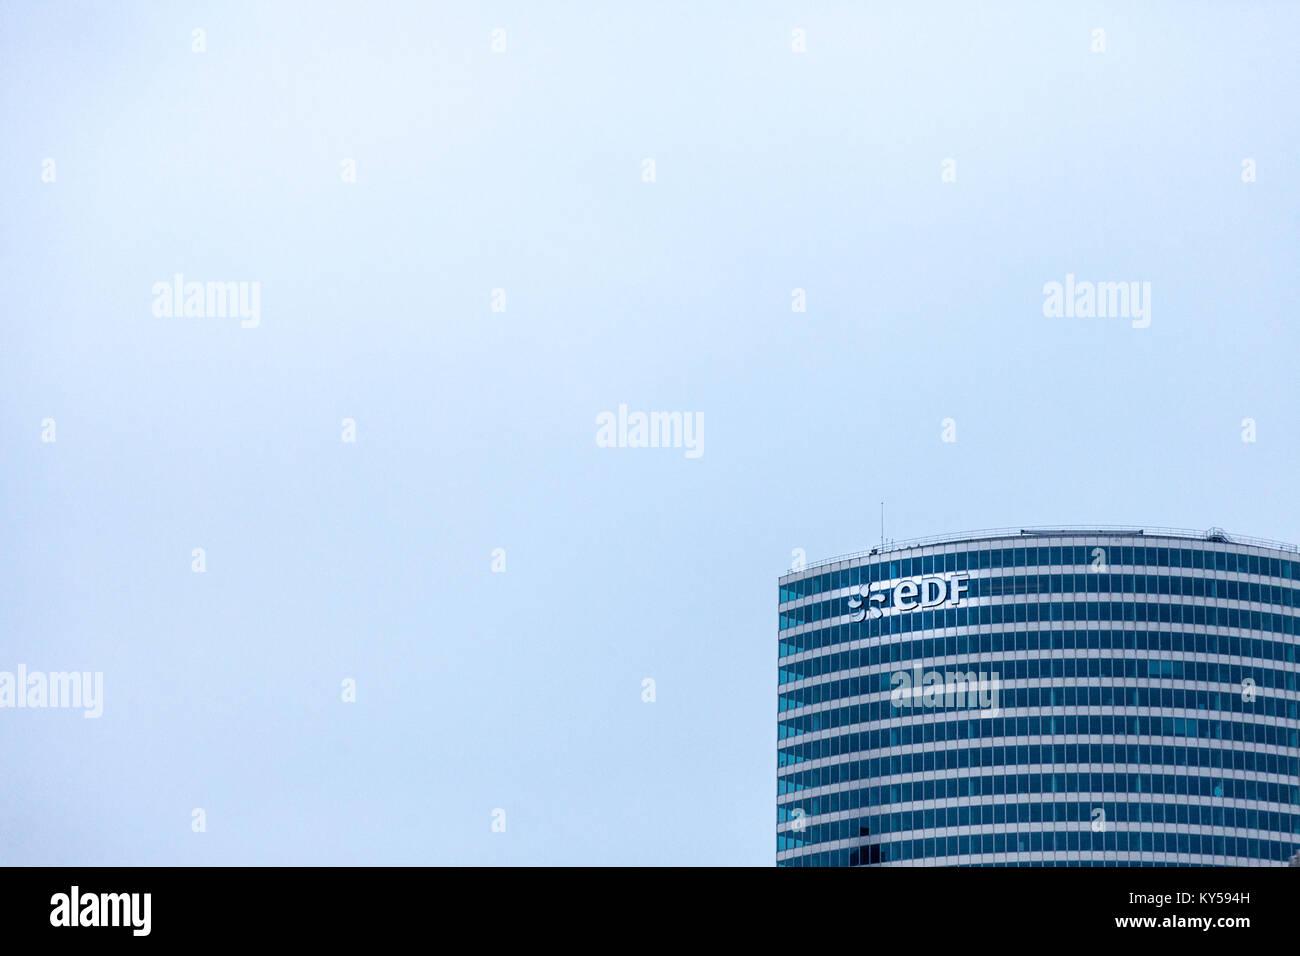 PARIS, FRANCE - DECEMBER 20, 2017: EDF logo on their main office in La Defense district. Electricite de France (EDF) - Stock Image